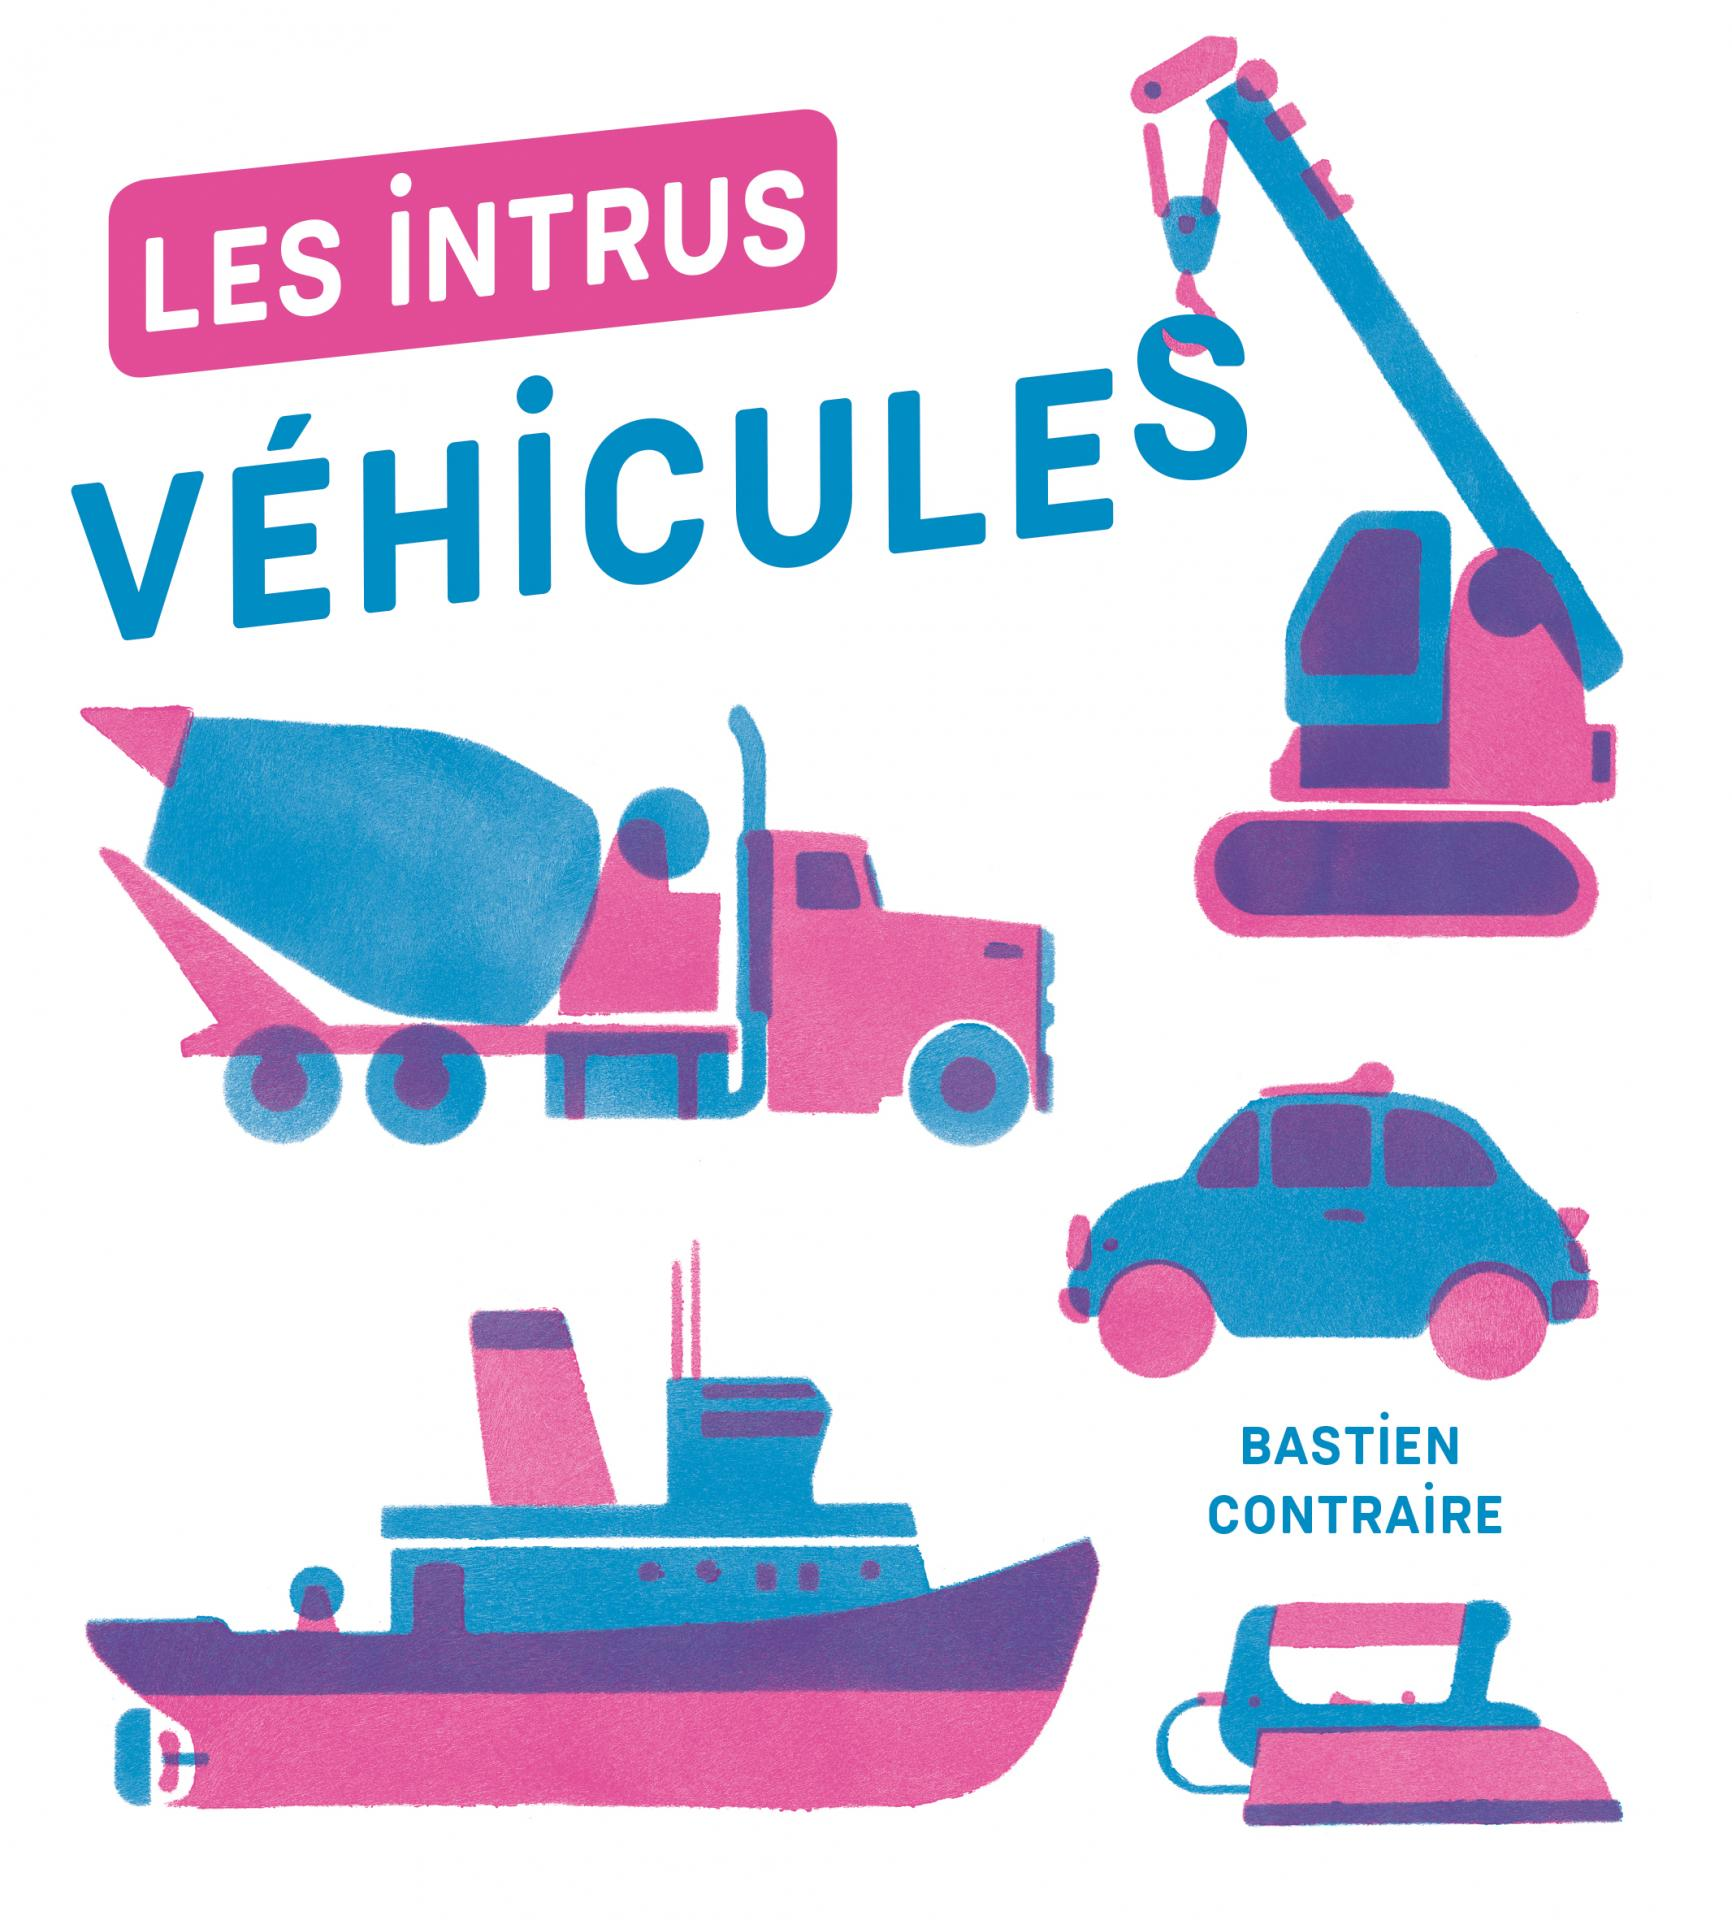 Intrusvehicules